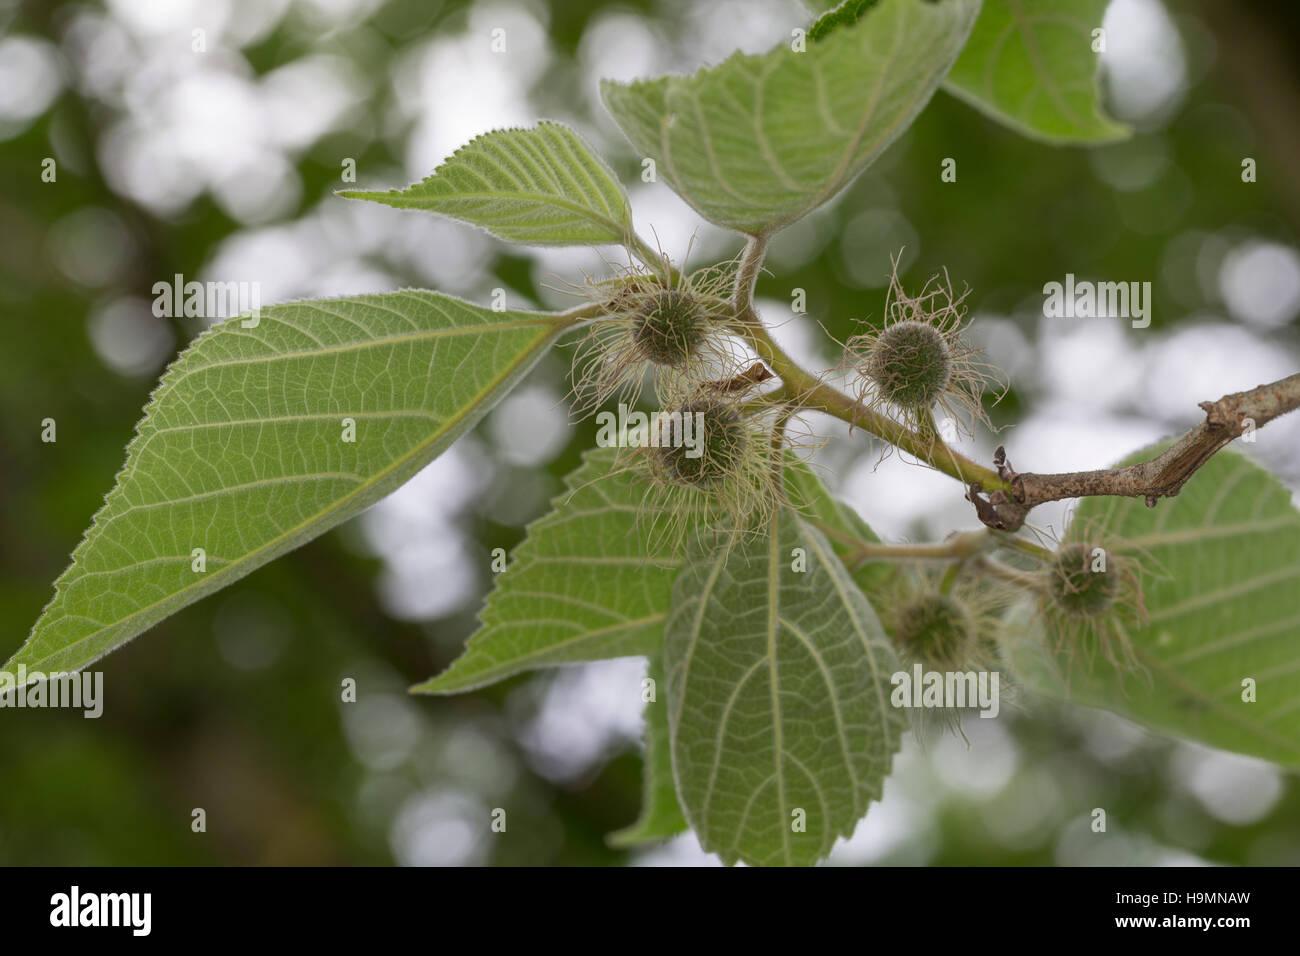 Papiermaulbeerbaum, Papier-Maulbeerbaum, Papiermaulbeere Gartenlandschaft Papierbaum, Broussonetia Papyrifera, Morus Stockbild